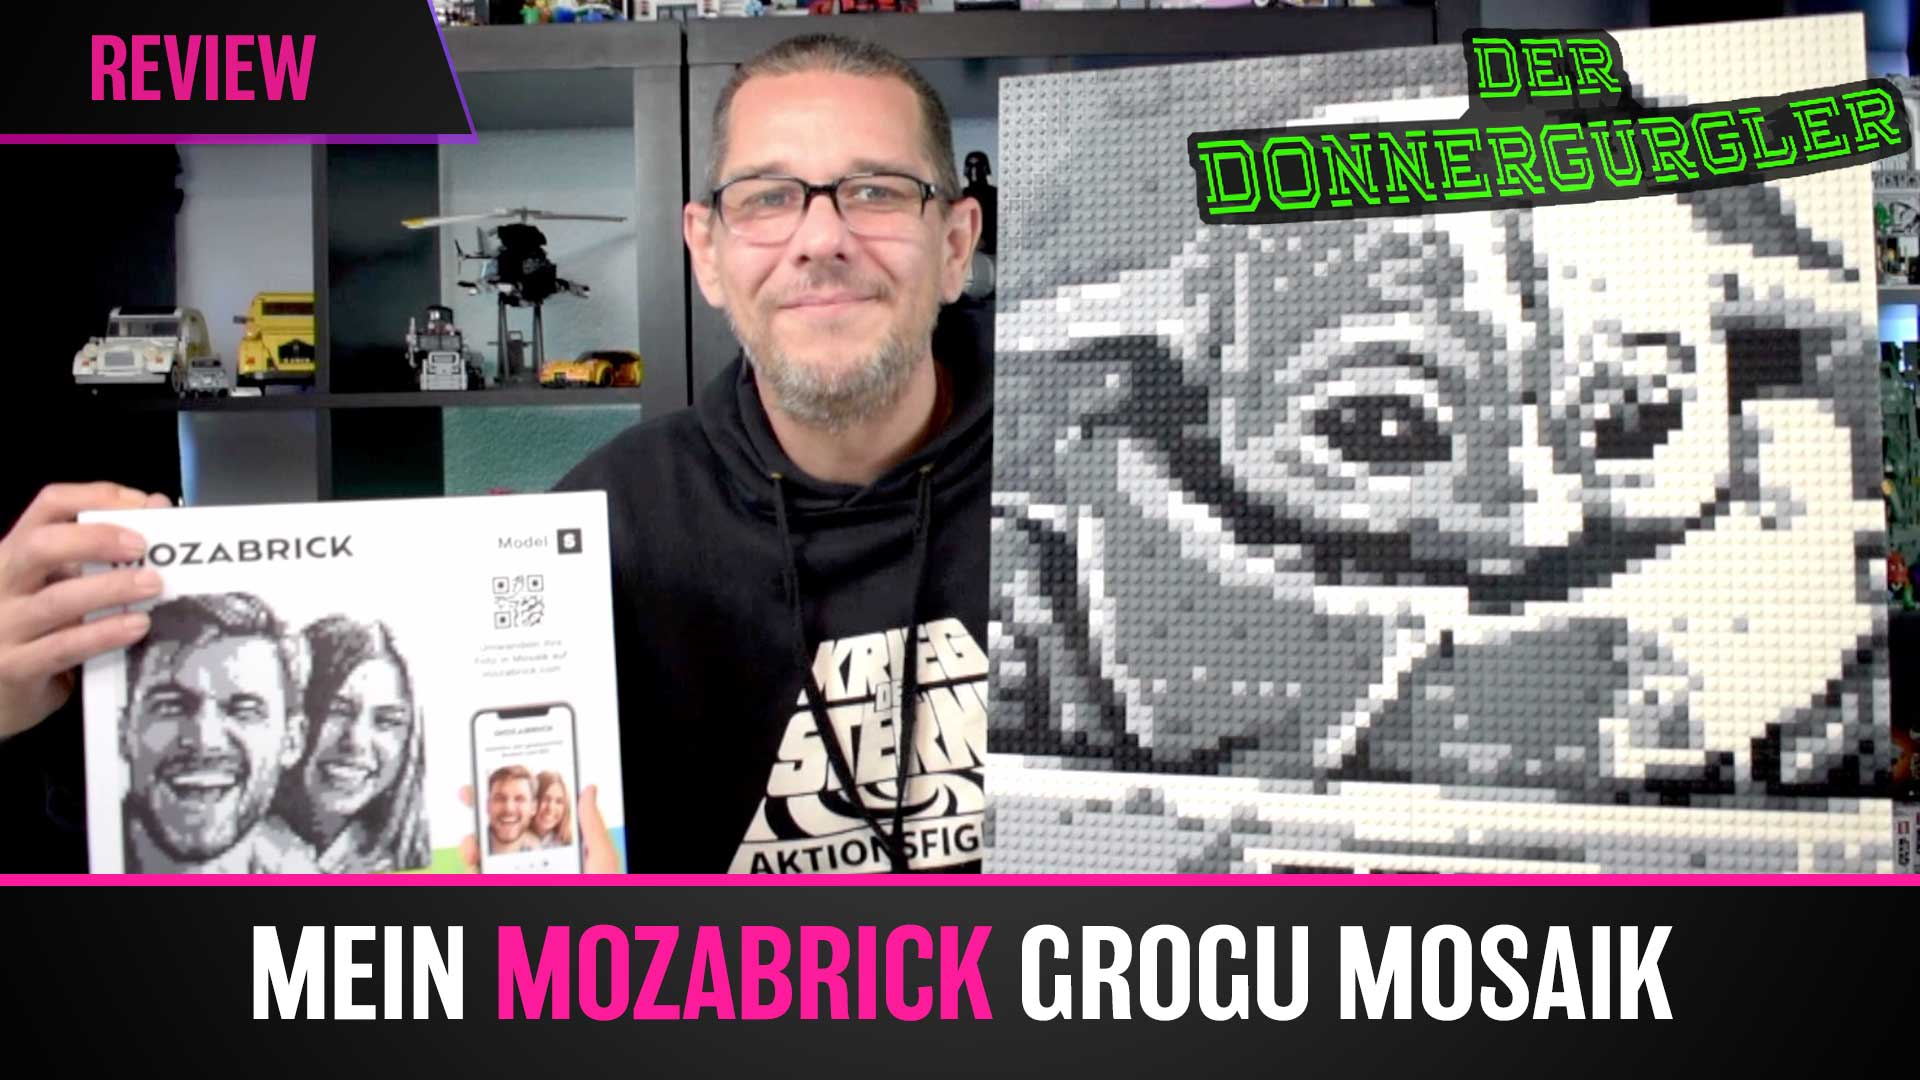 Mozabrick Mosaik Set-S Review - Mein Grogu Mosaik